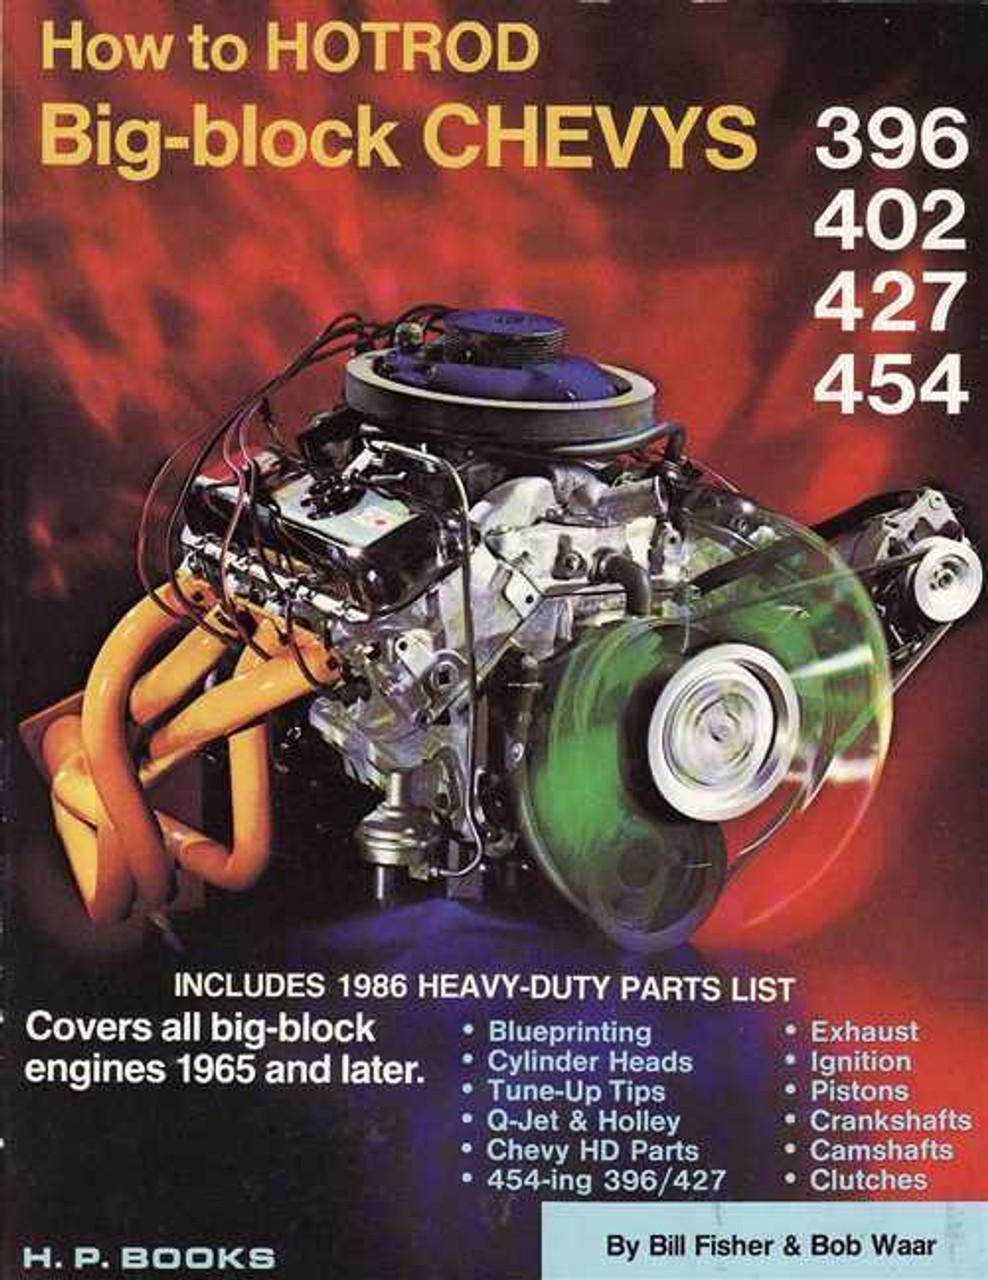 How to Hotrod Big-block Chevys 396, 402, 427, 454